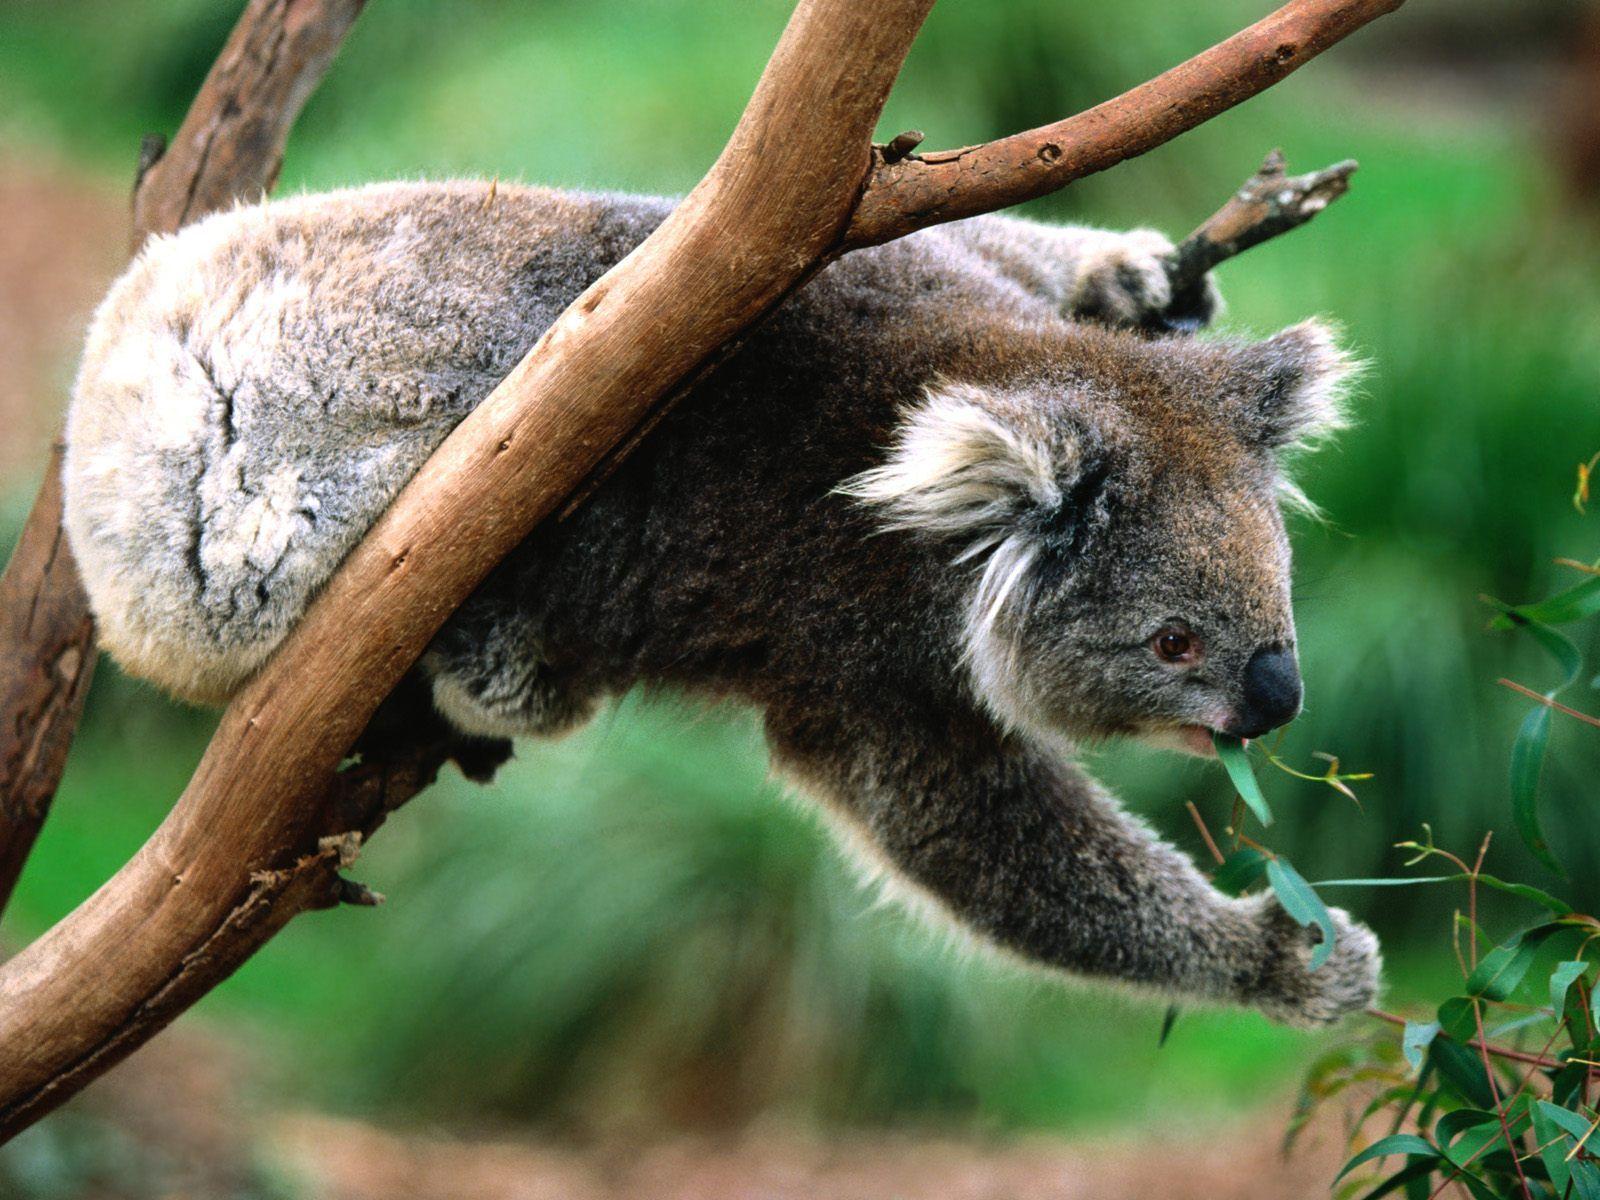 Tapety zvieratá - Koala Greens